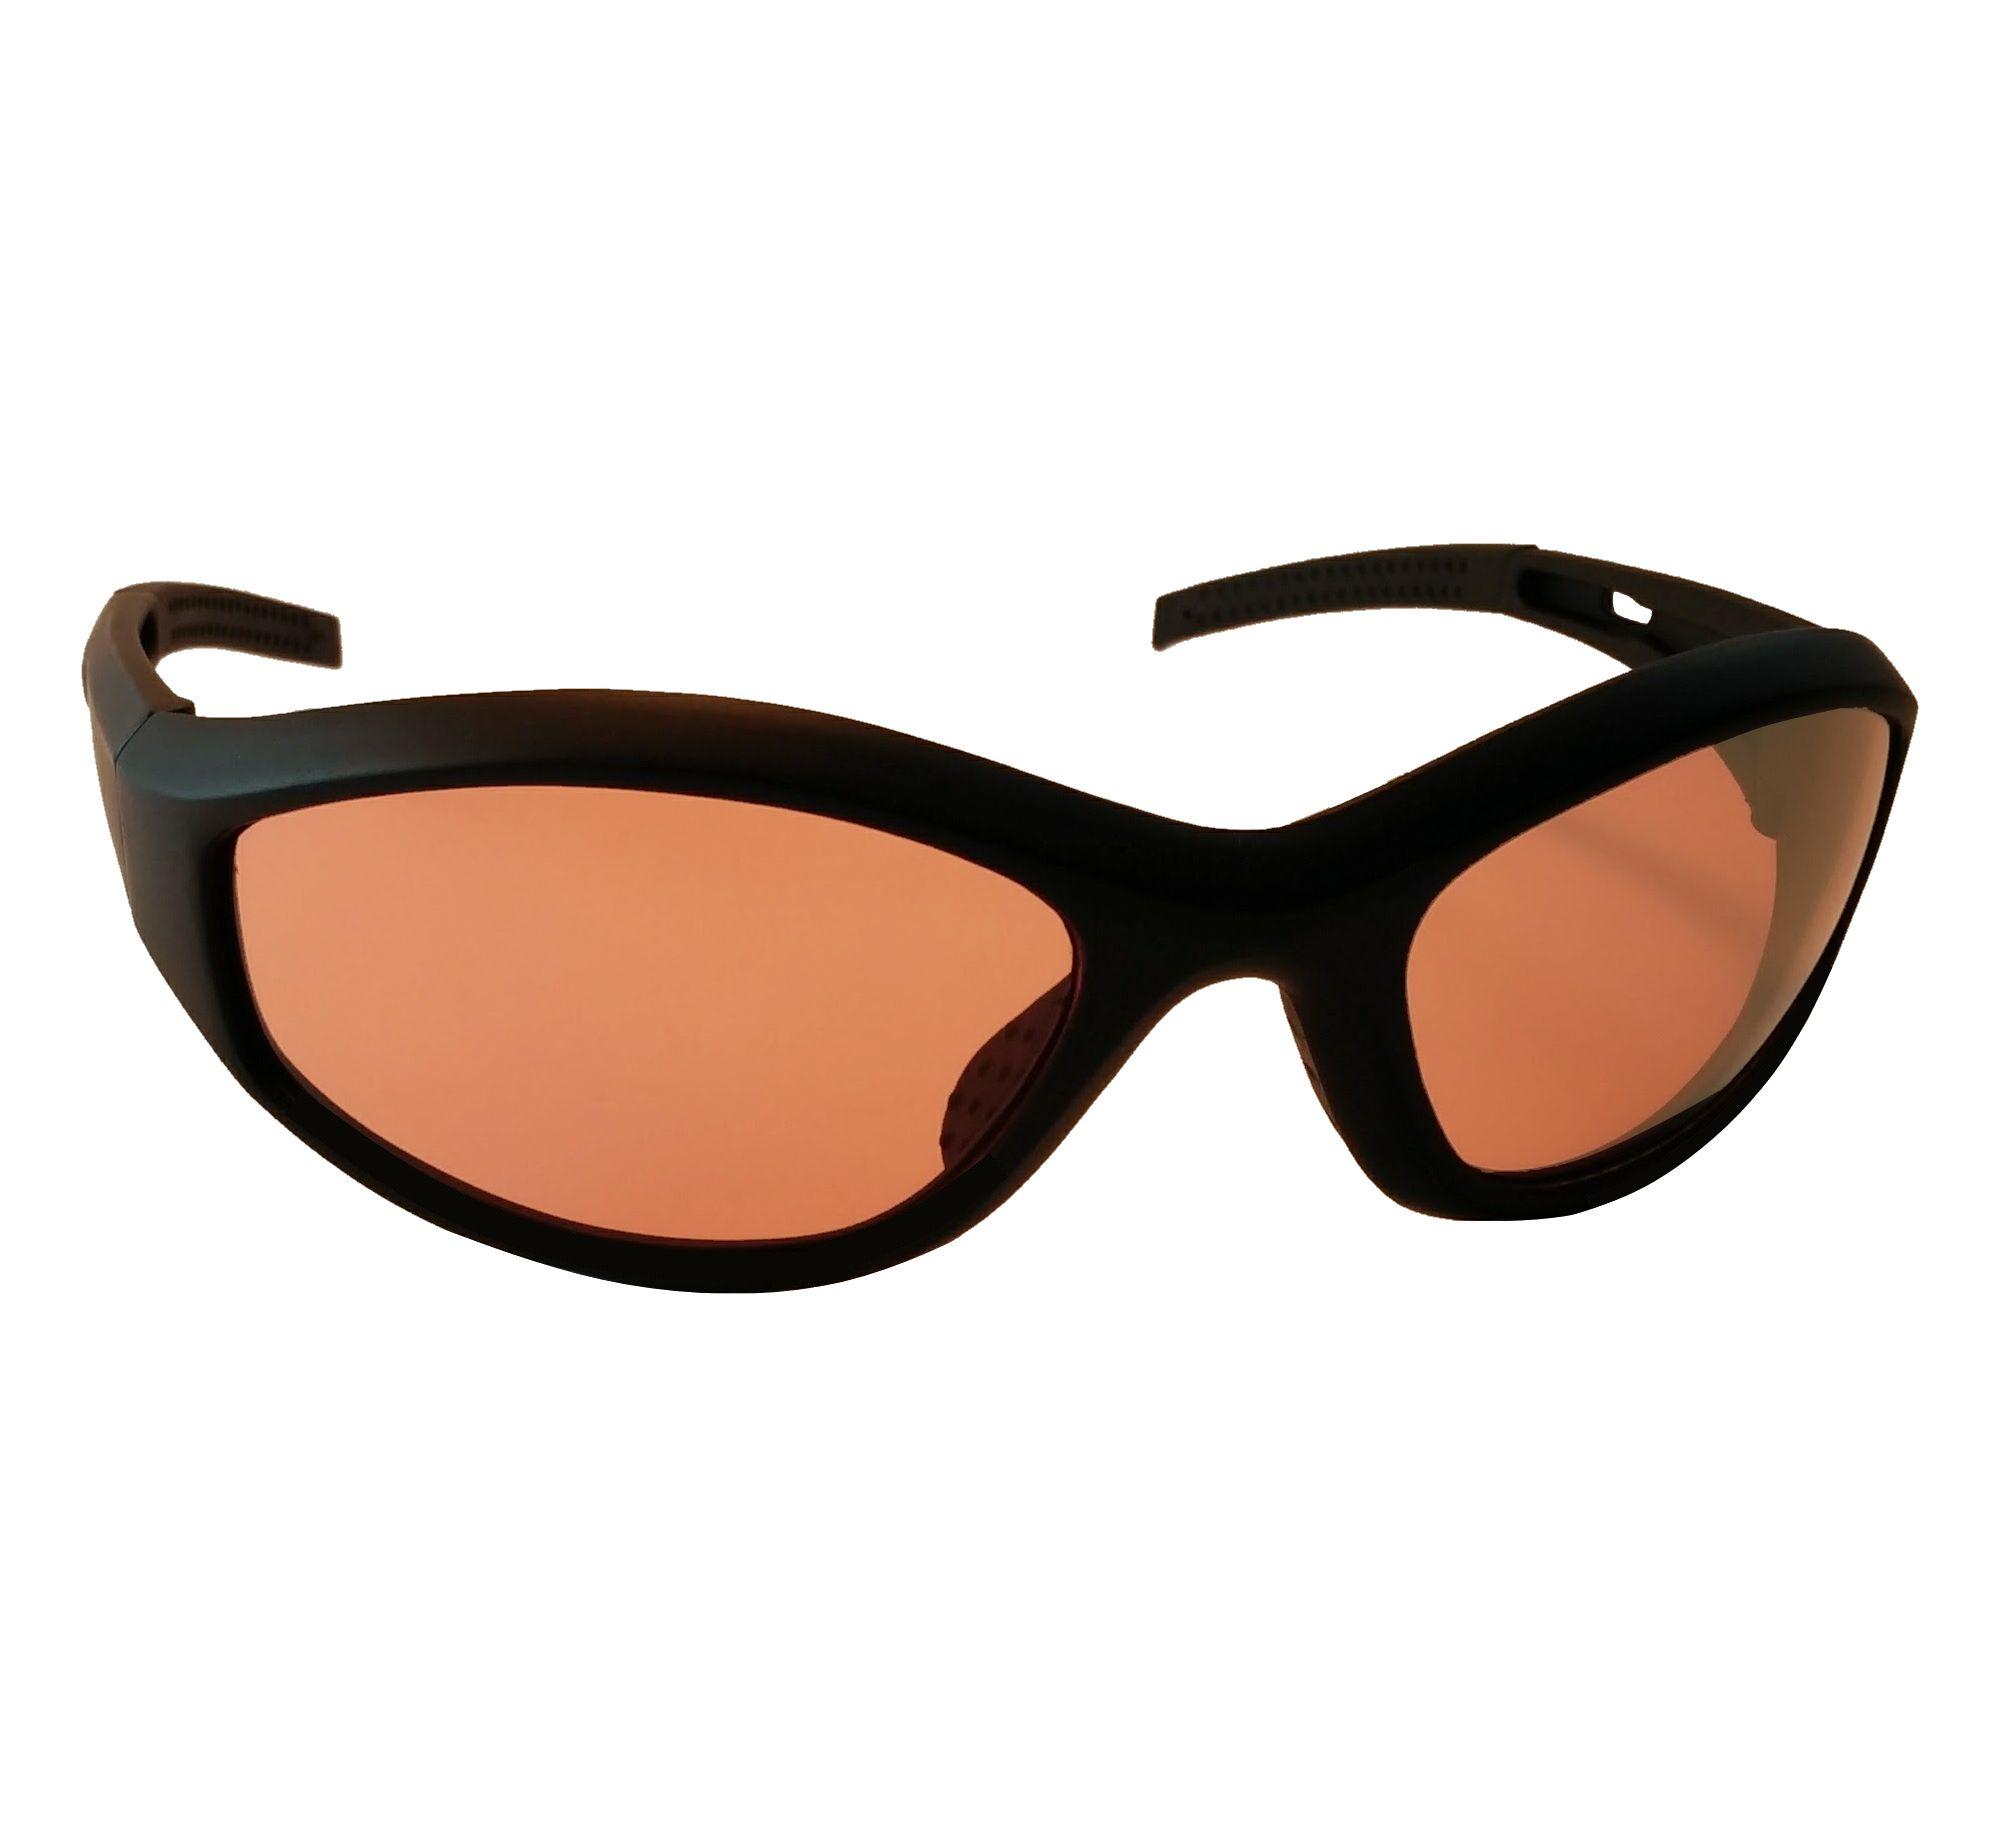 COIMBRA TQ | Collections | Etnia Barcelona | Glasses